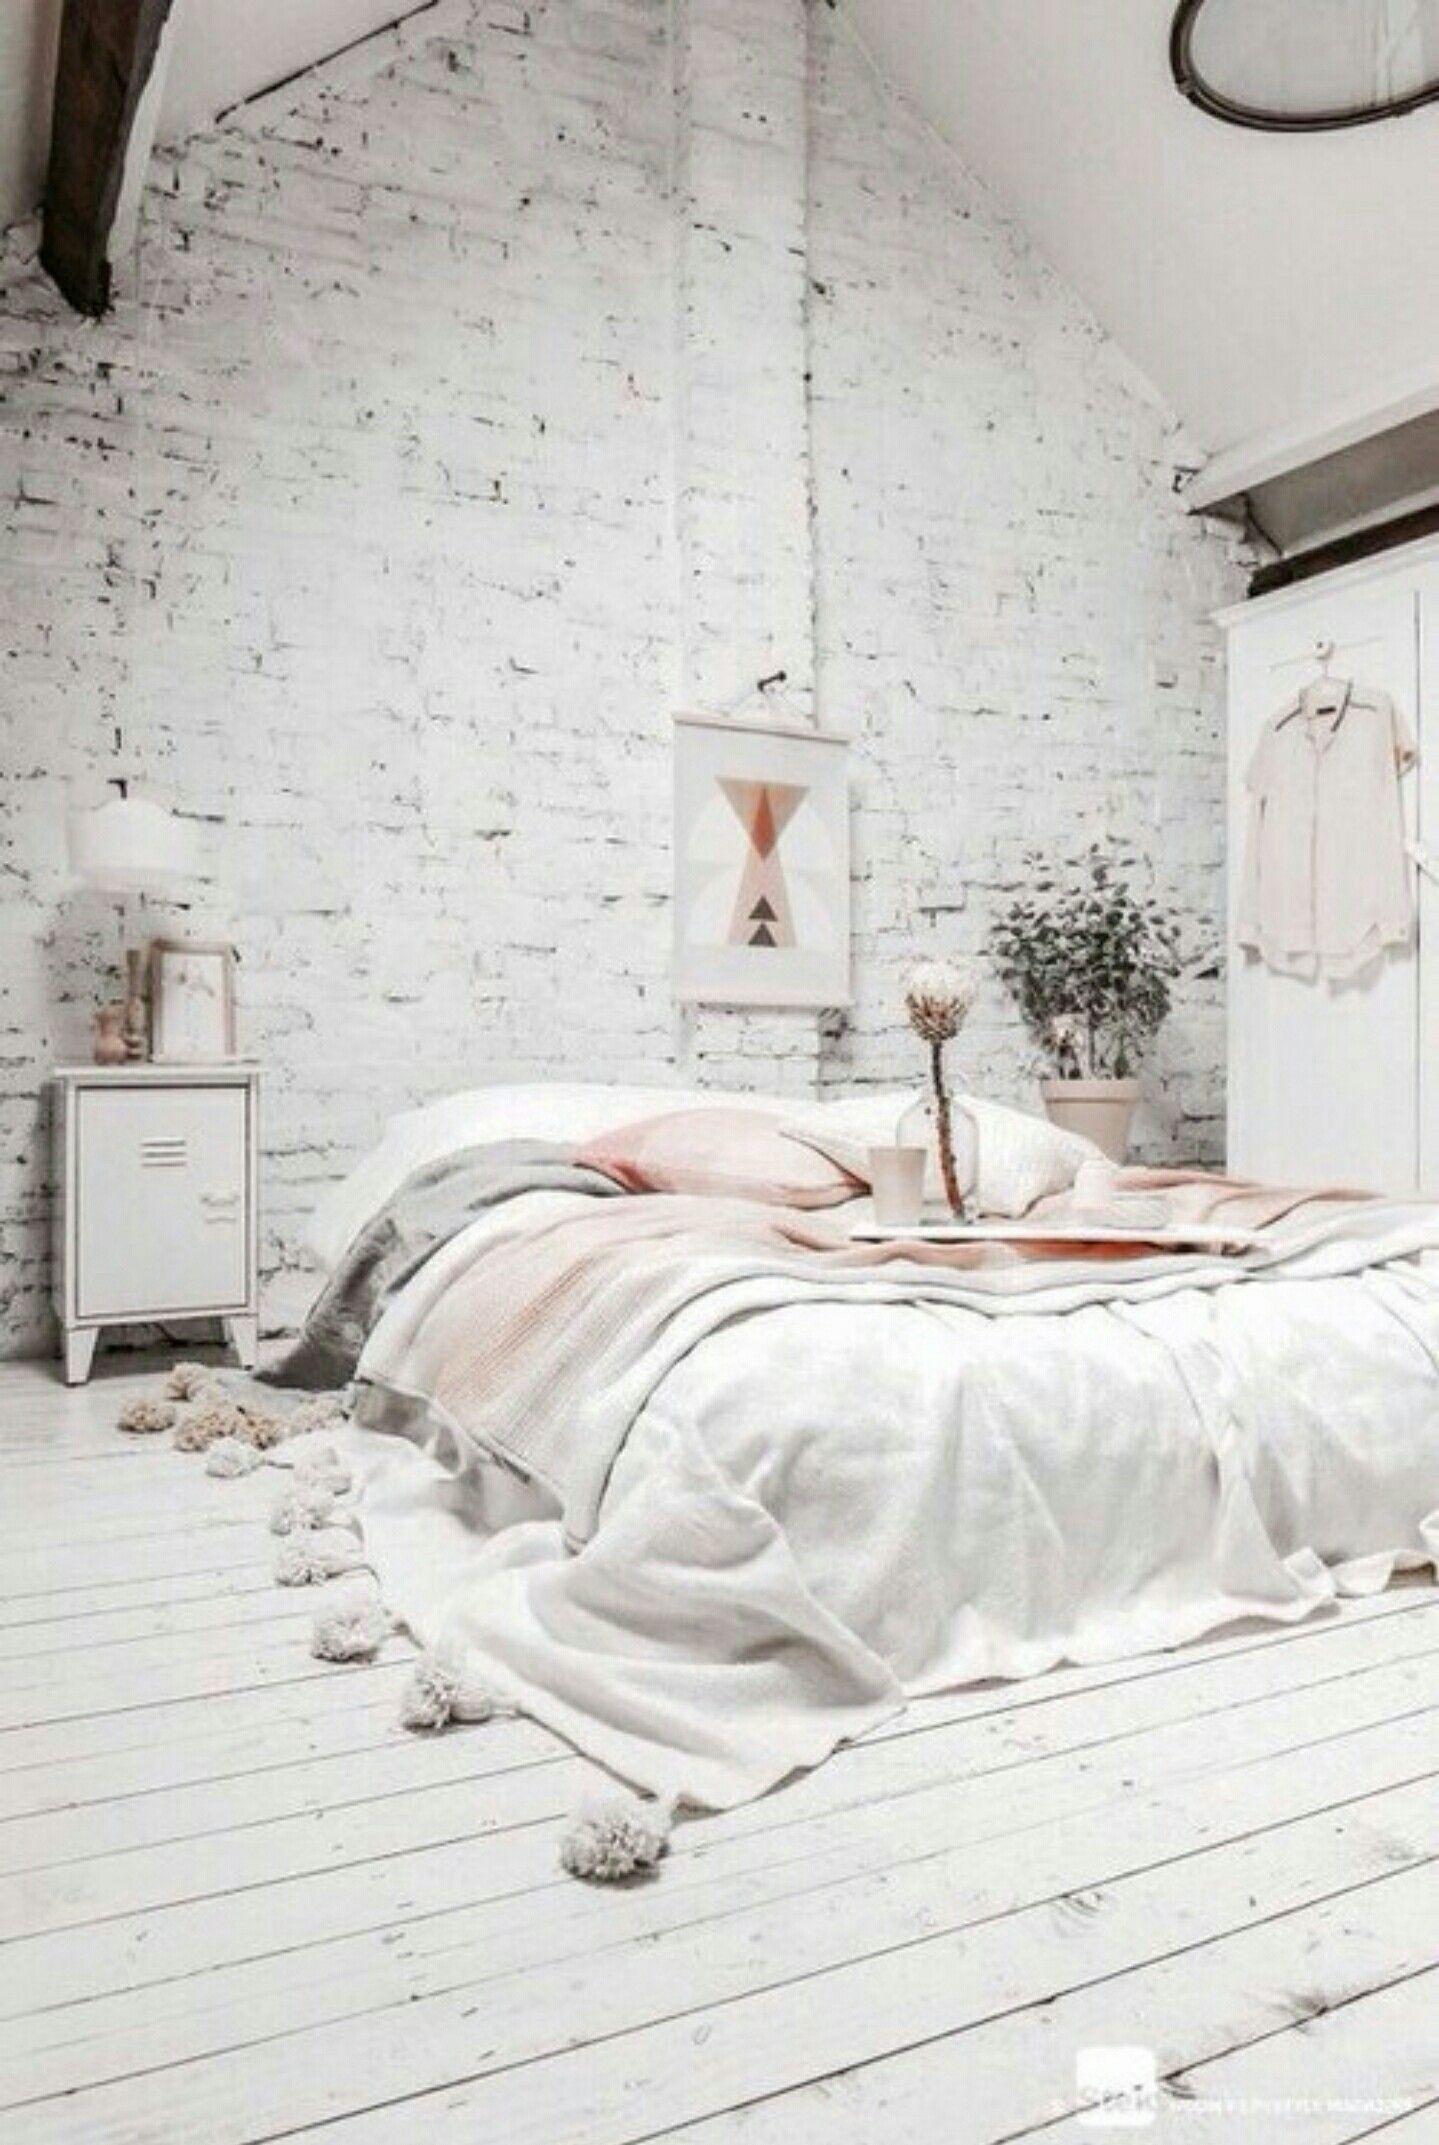 Rose Gold Black White And Grey Bedroom Interior Bedroom Design Home Bedroom